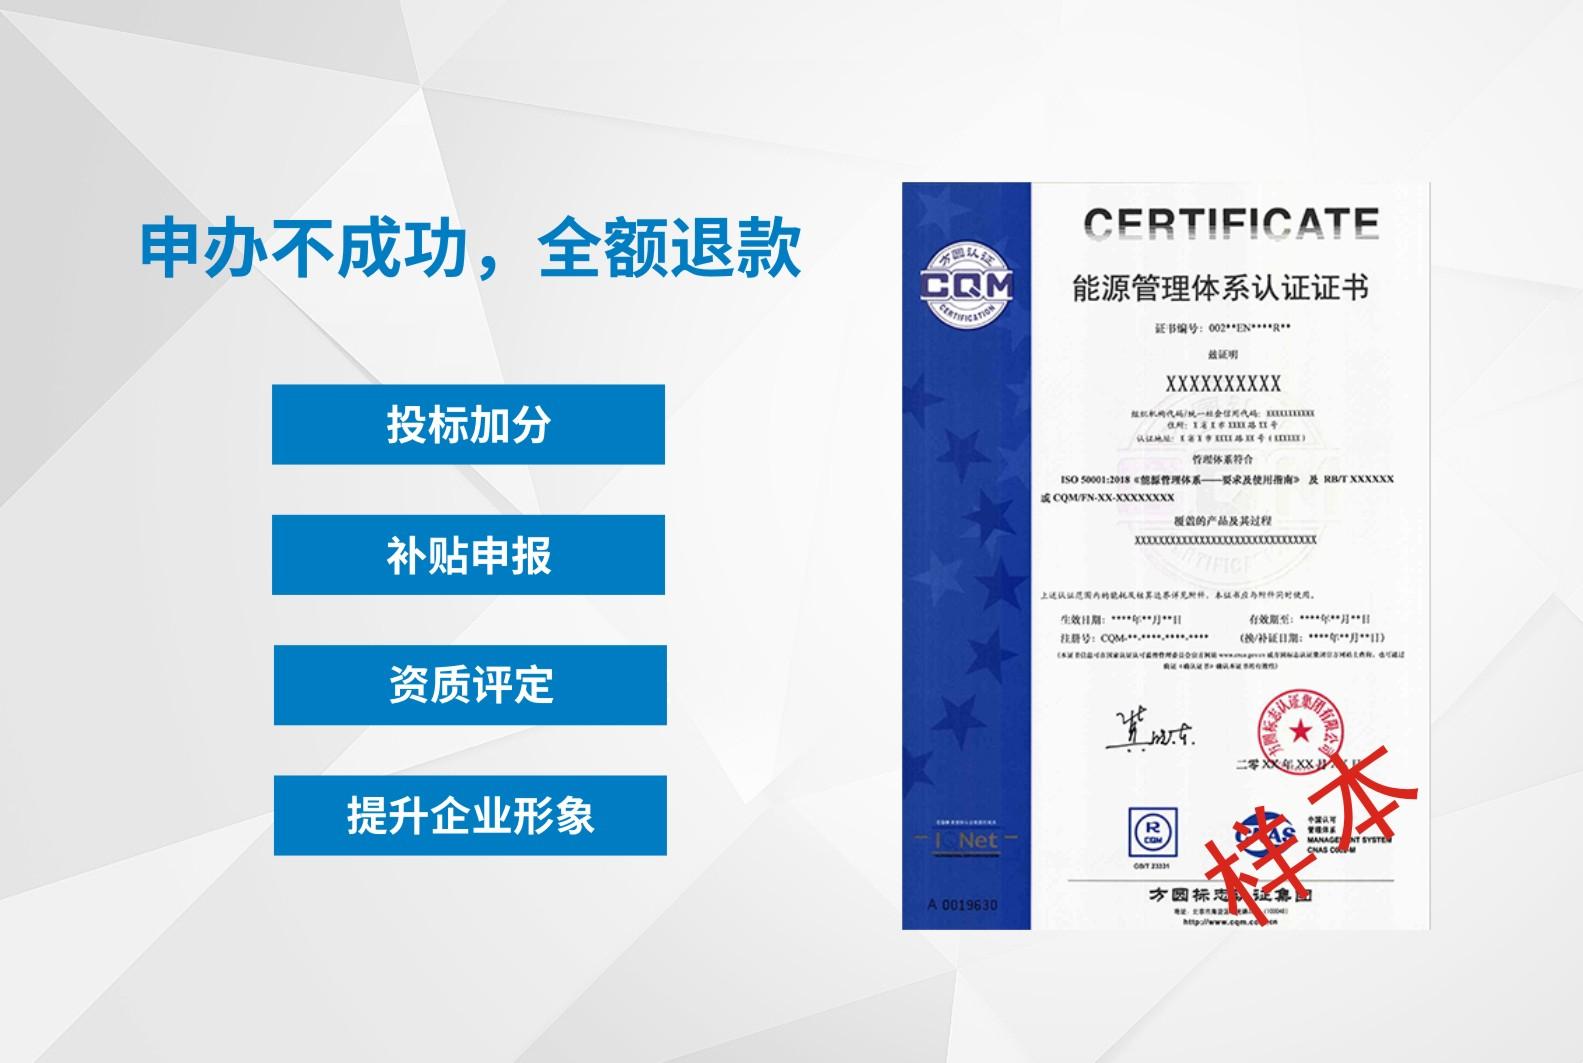 ISO5001-能源管理體系認證